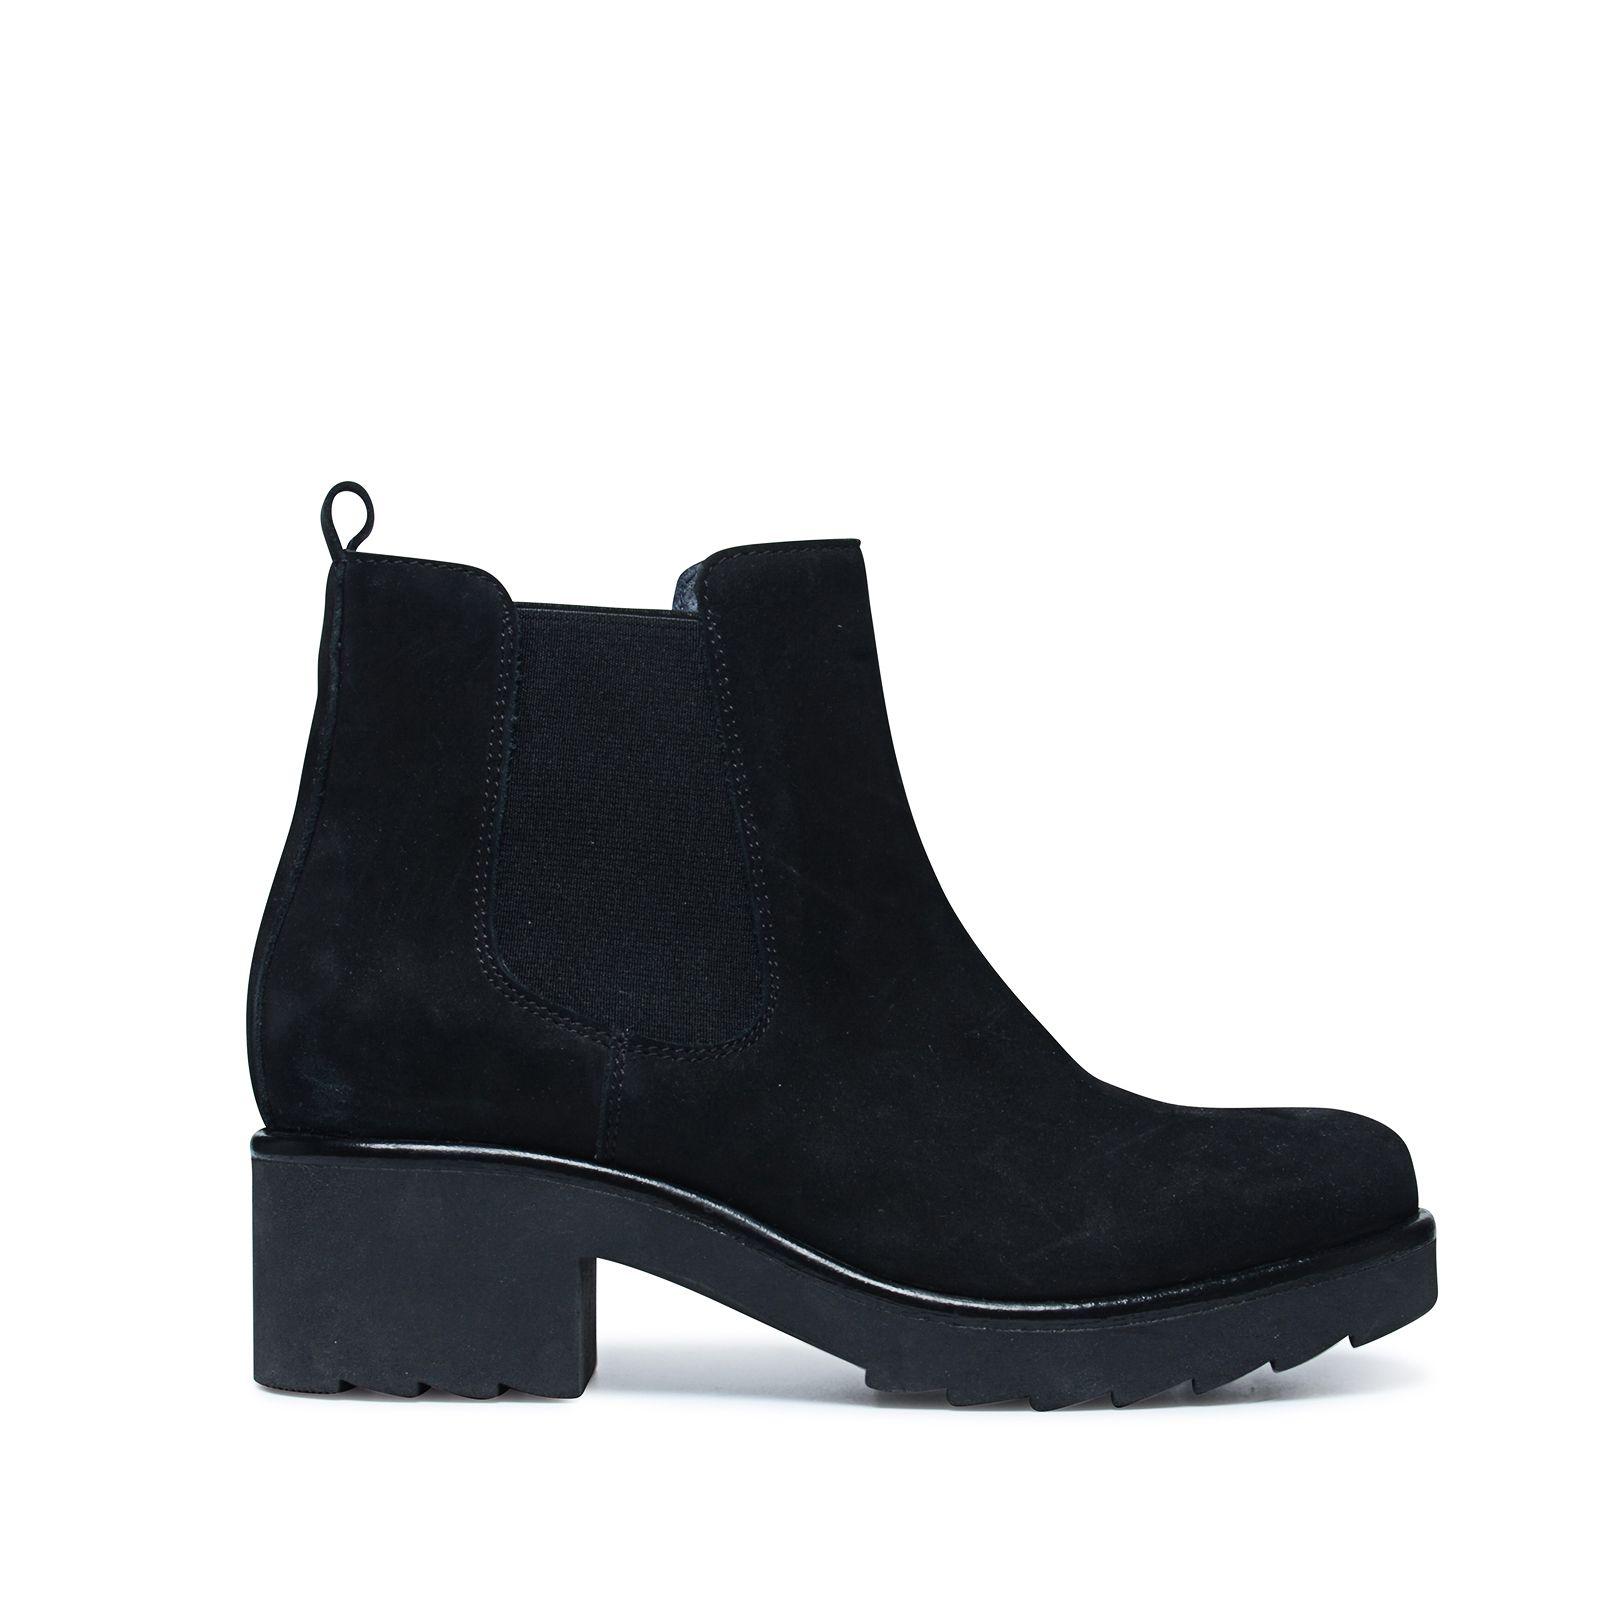 schwarze chelsea boots mit plateau. Black Bedroom Furniture Sets. Home Design Ideas